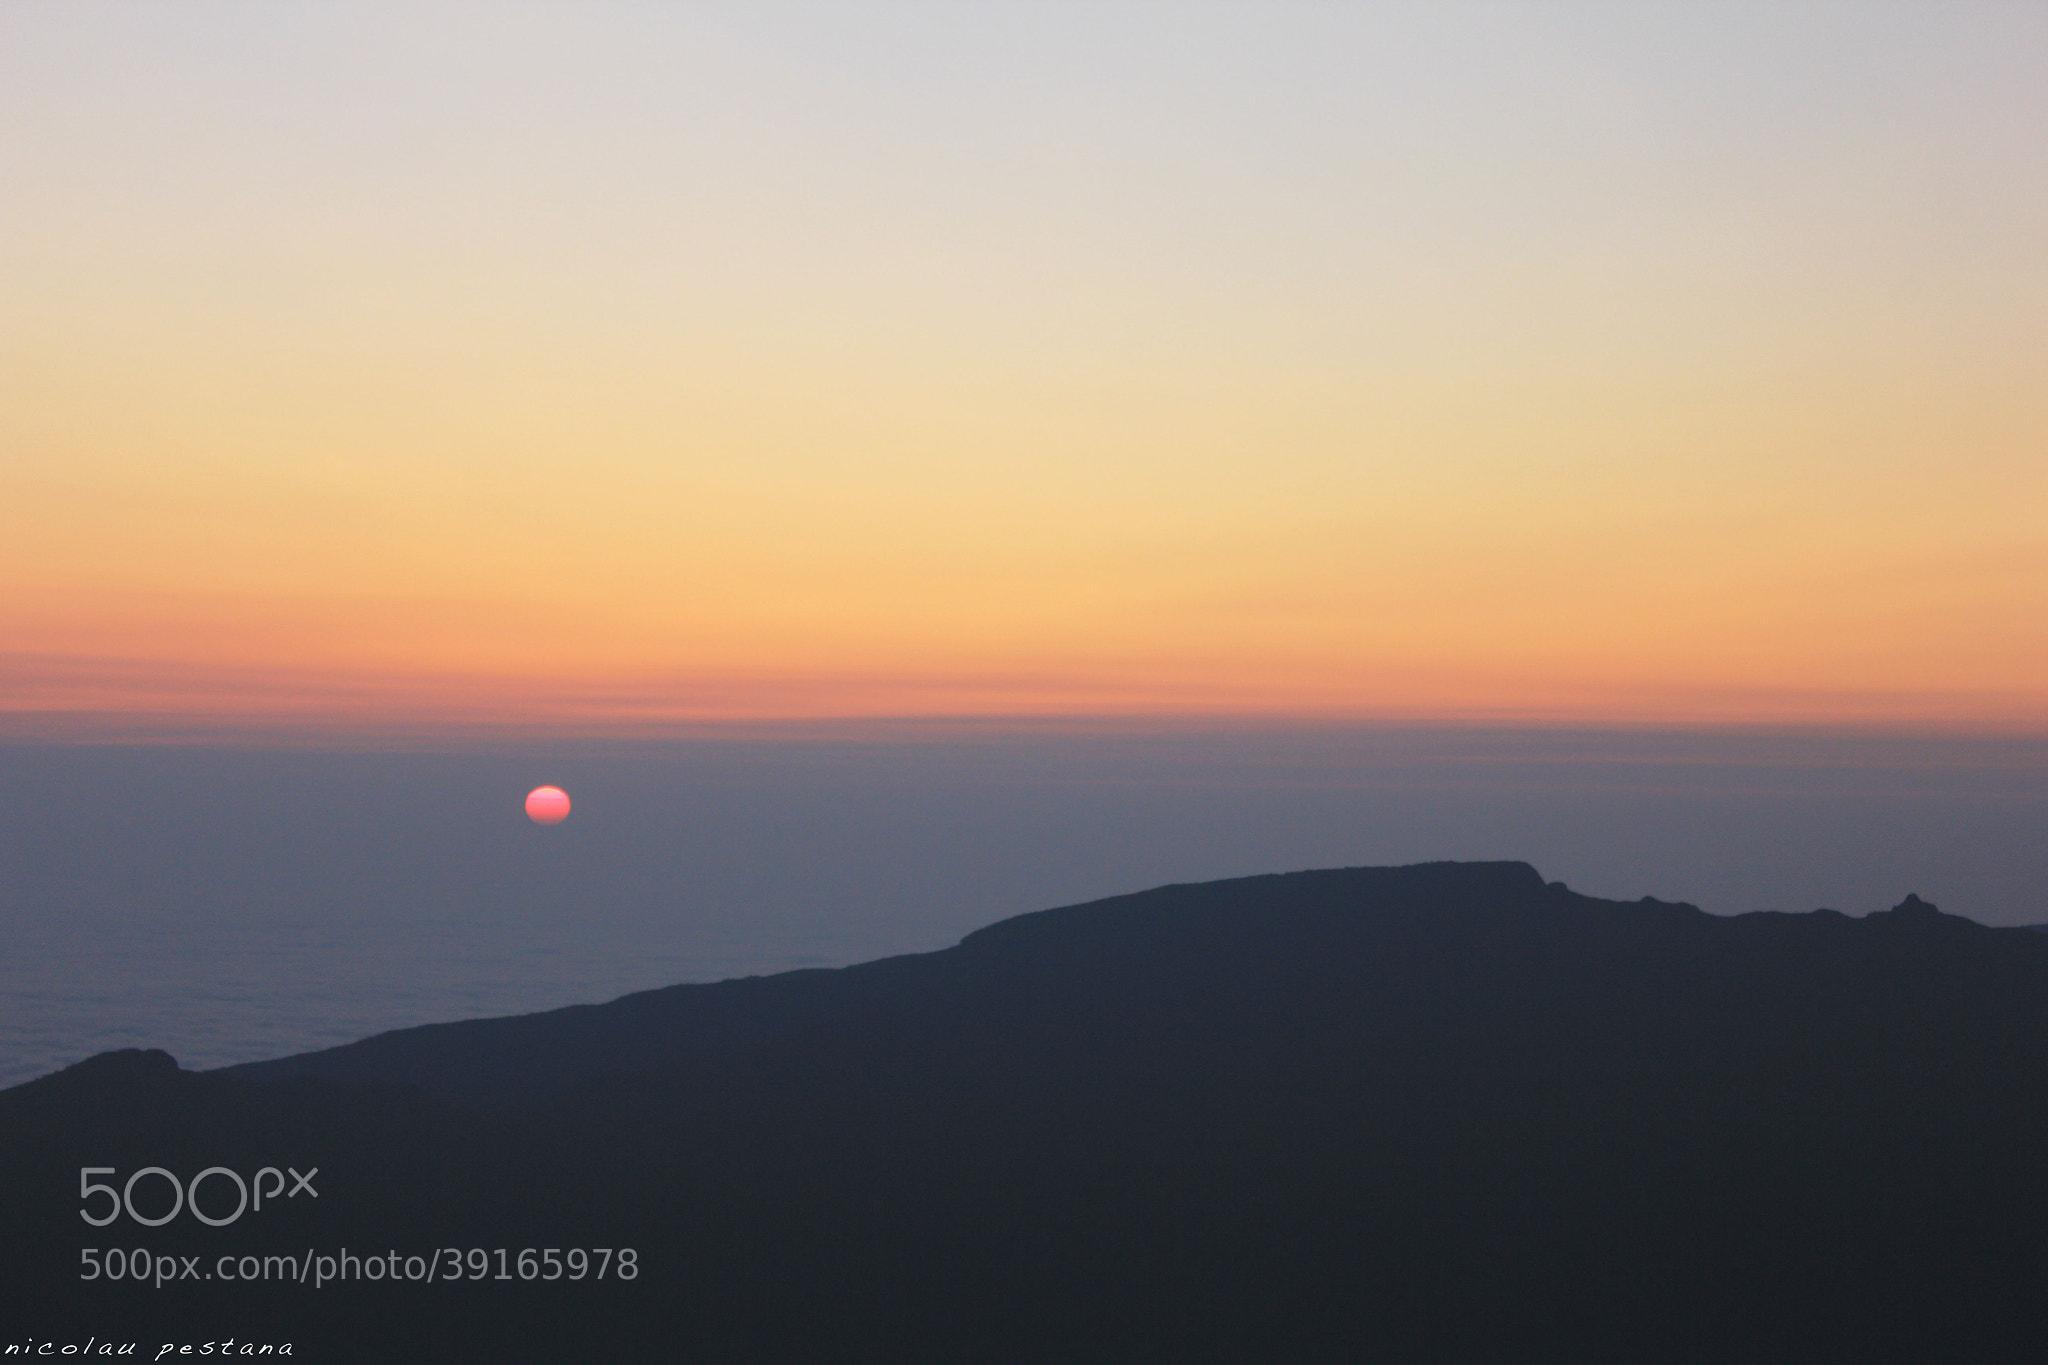 Photograph Sunrise - Madeira by nicolau pestana on 500px